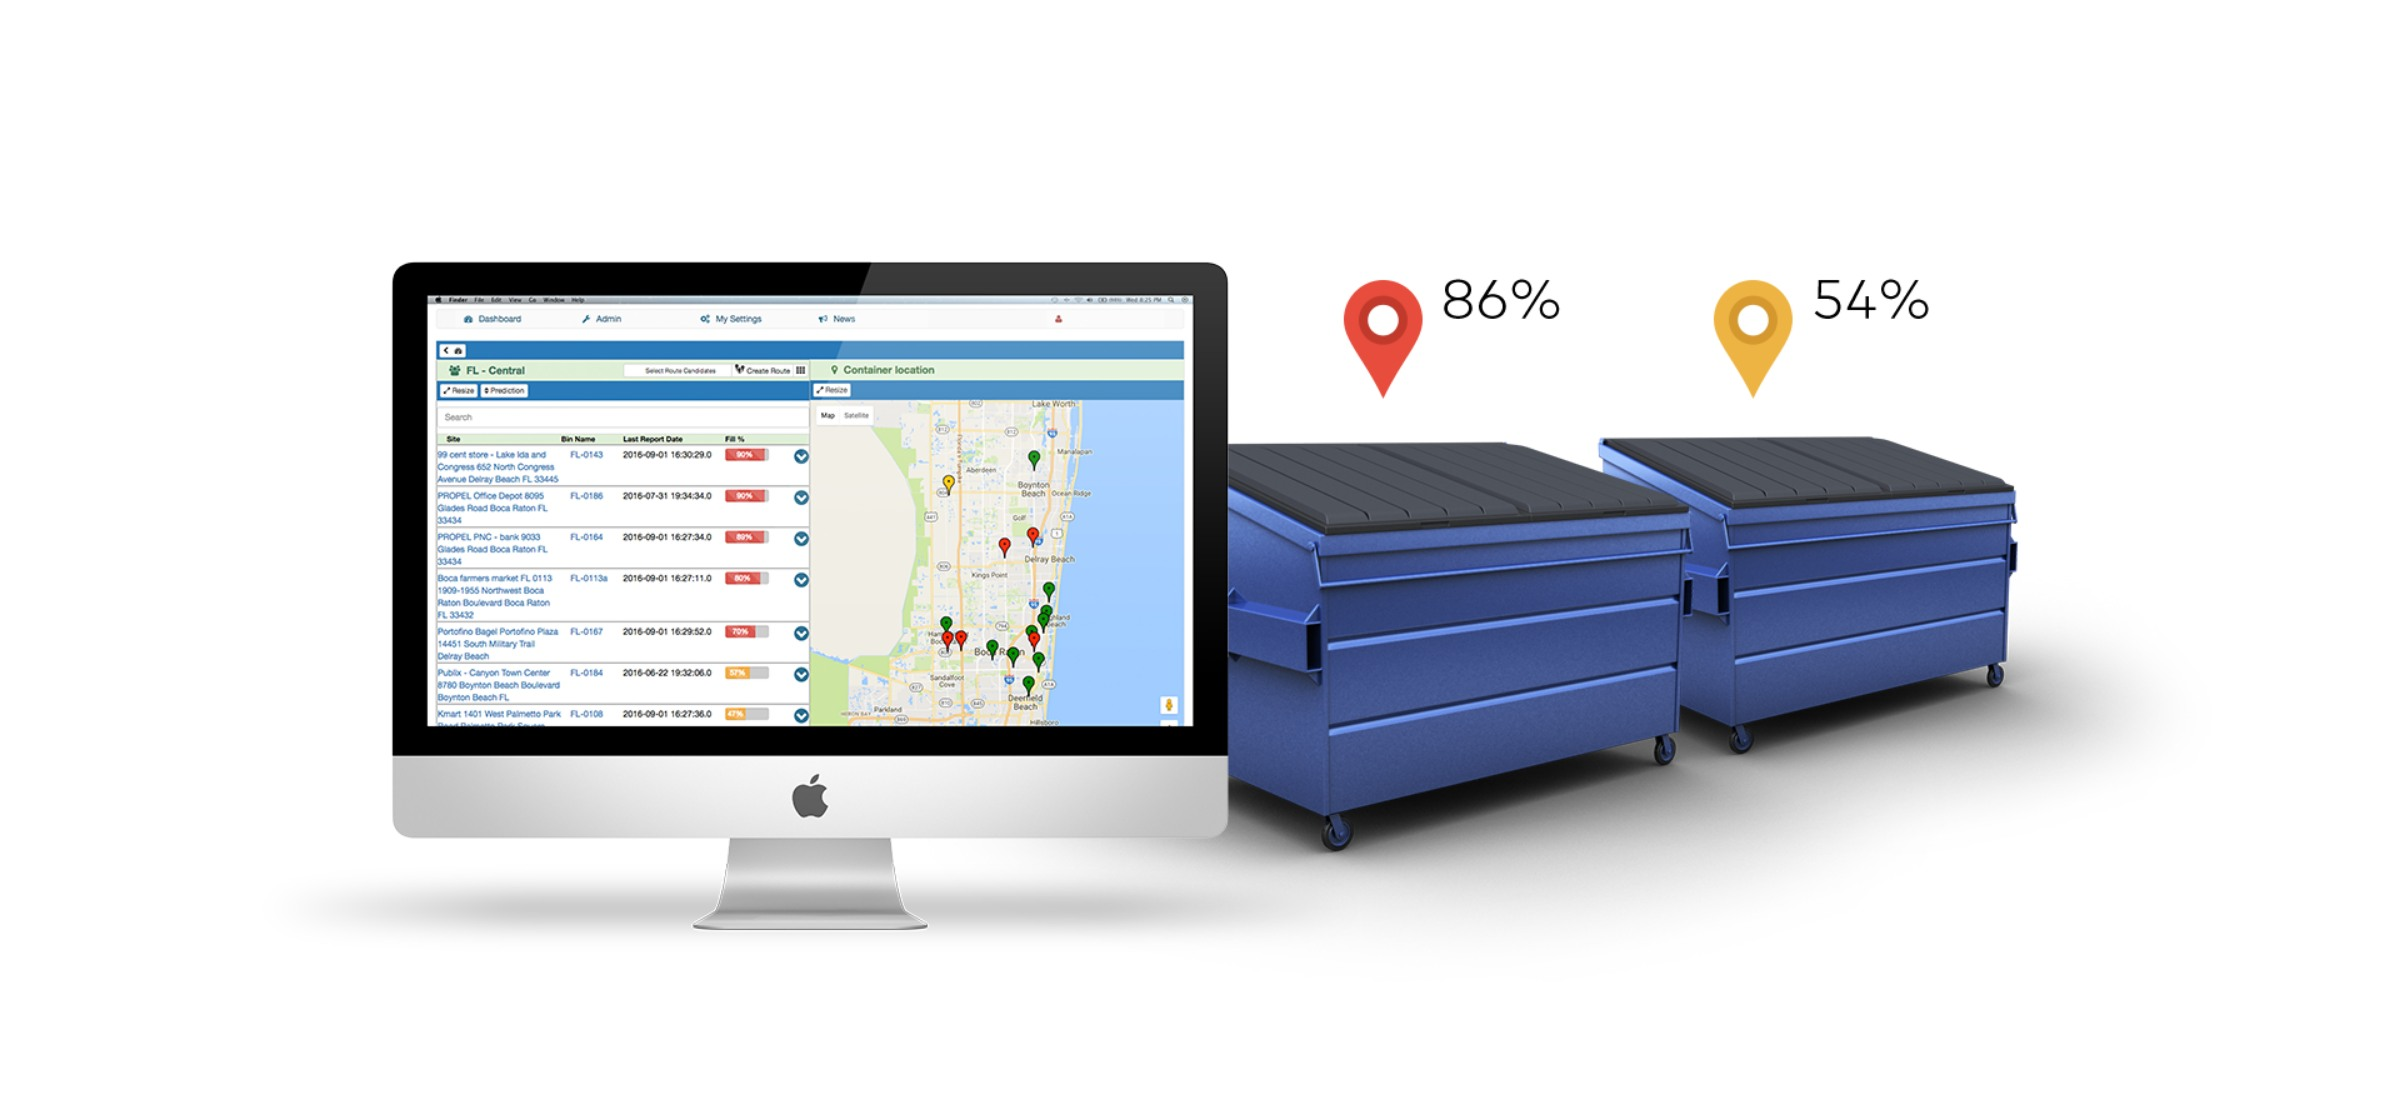 OnePlus Intelligent Waste Monitoring | Sigfox Partner Network | The